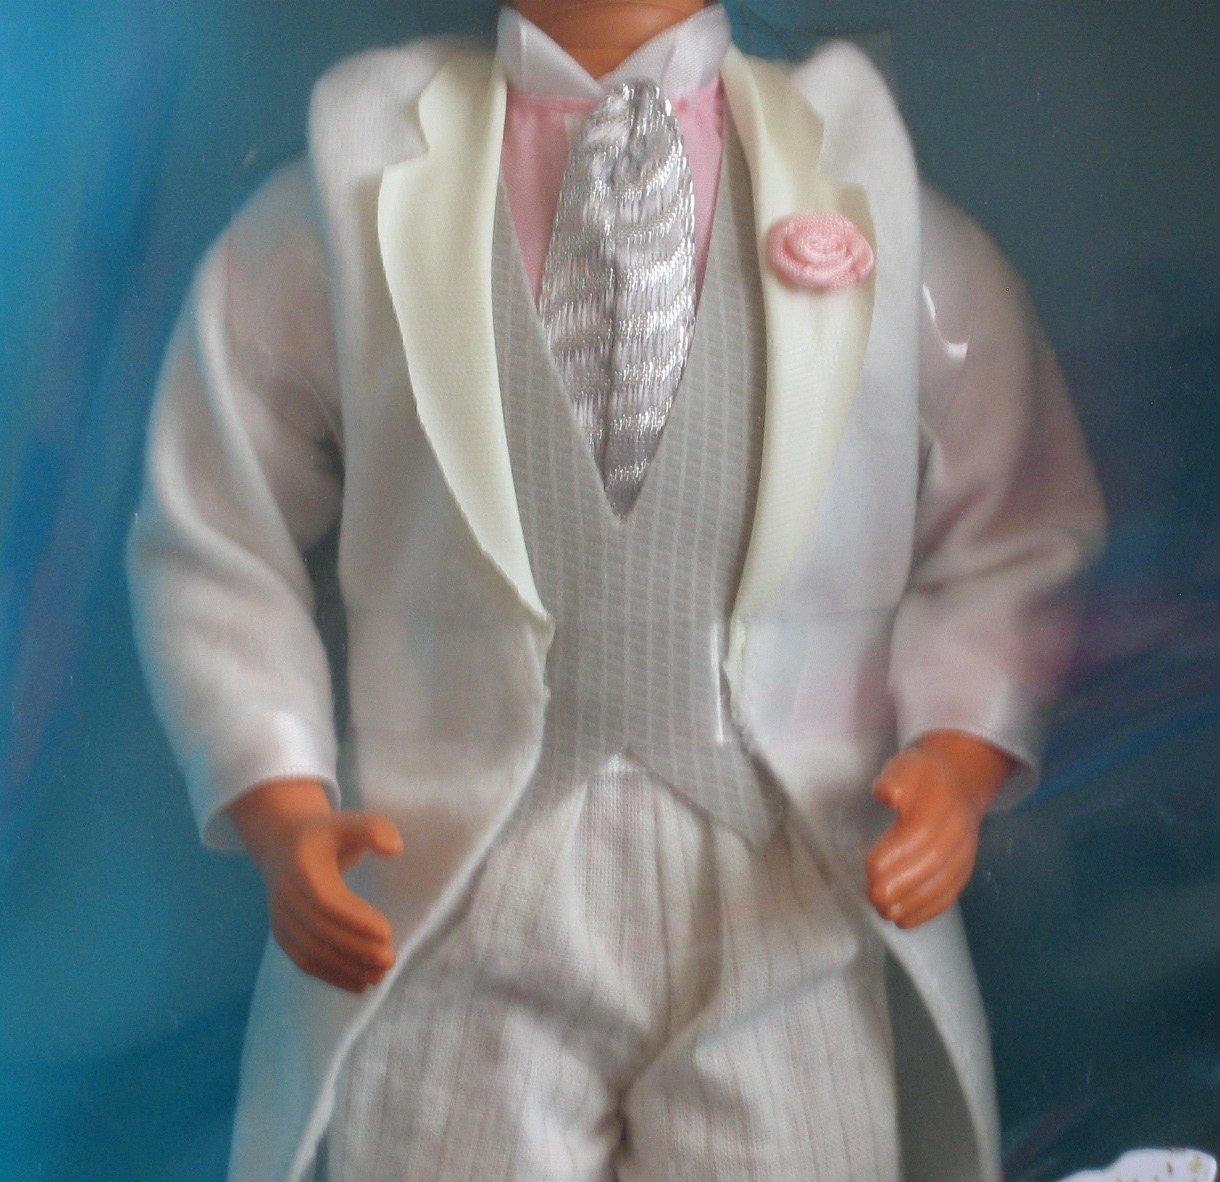 Amazon.com: Barbie Día de boda Alan muñeca (1990): Toys & Games